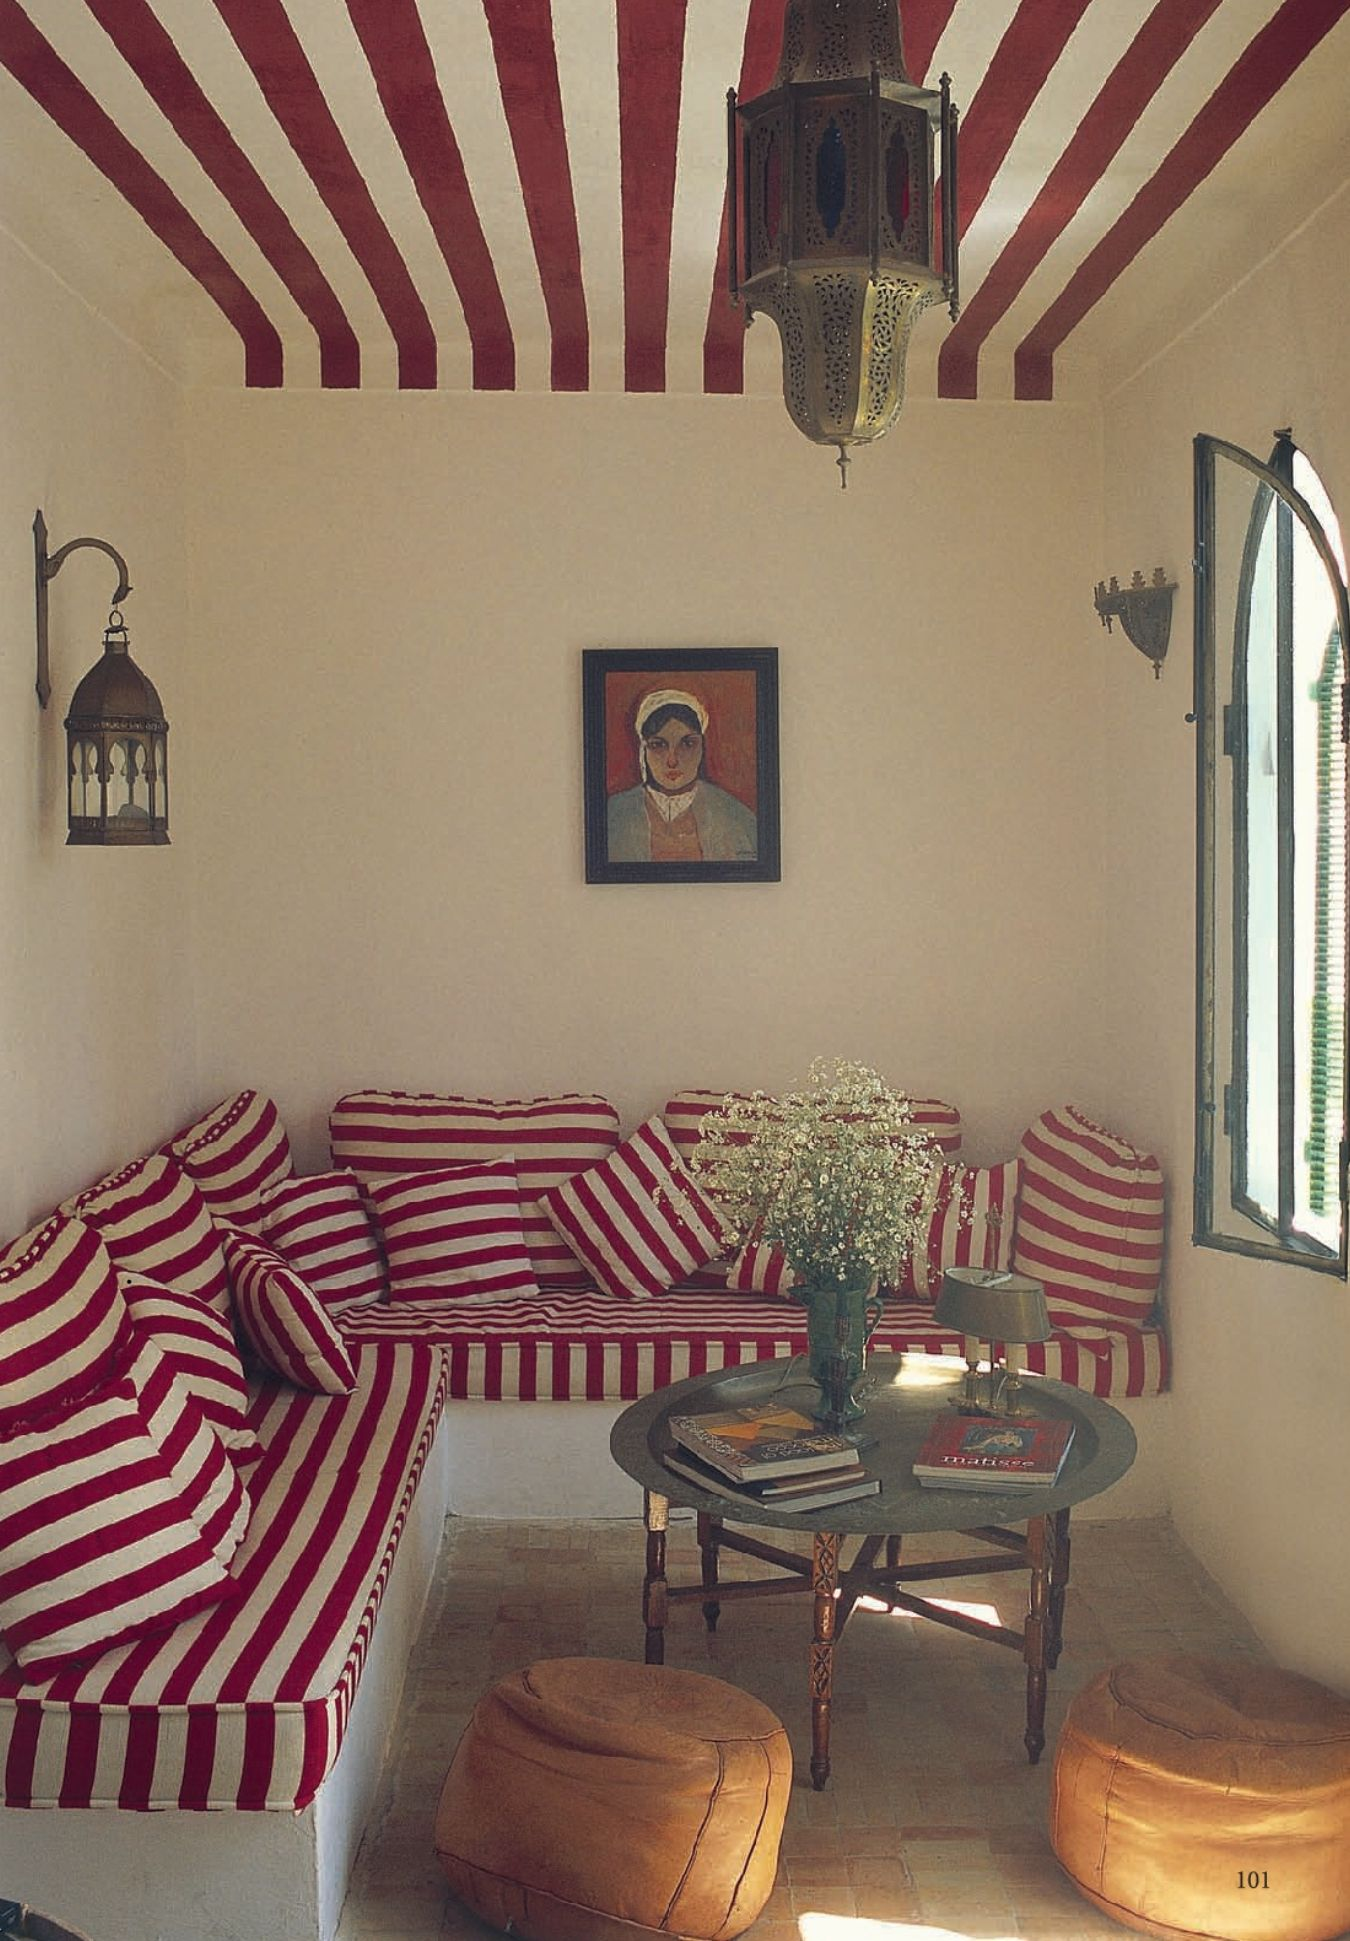 Gavin Houghton S Tangier Riad The World Of Interiors December